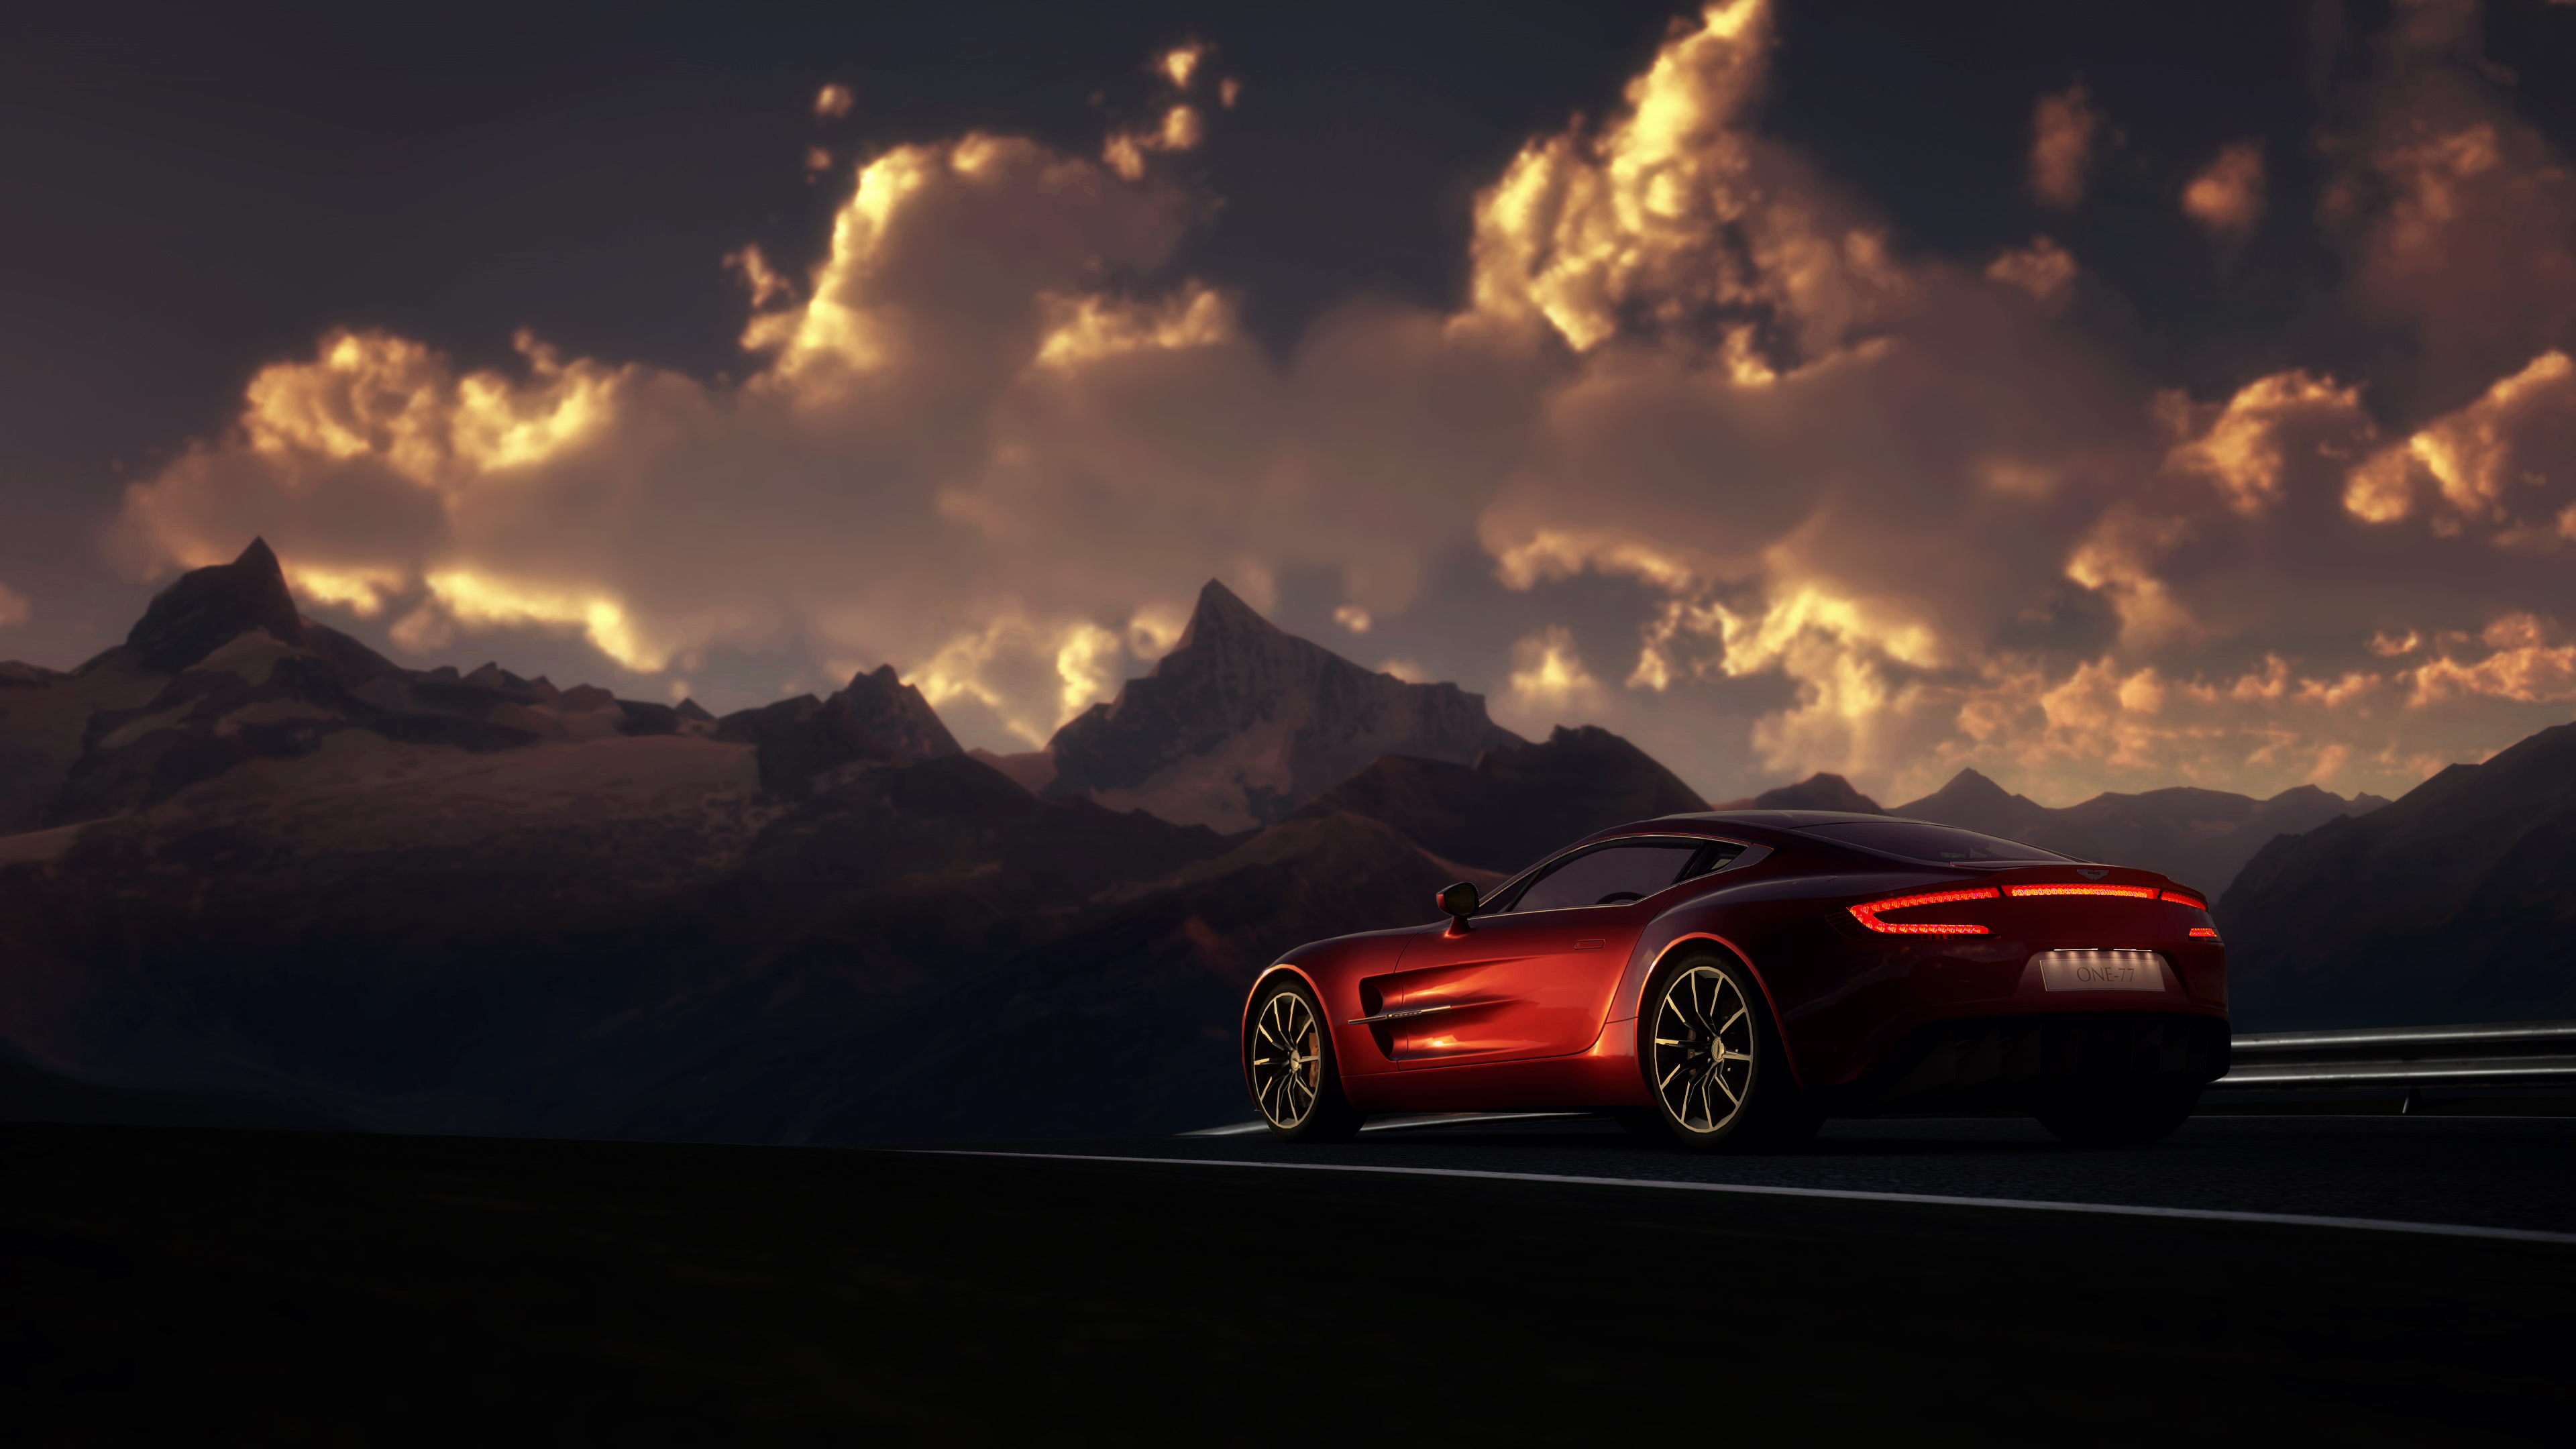 Wallpaper 4k Aston Martin One 77 Gran Turismo 6 4k wallpapers 3840x2160